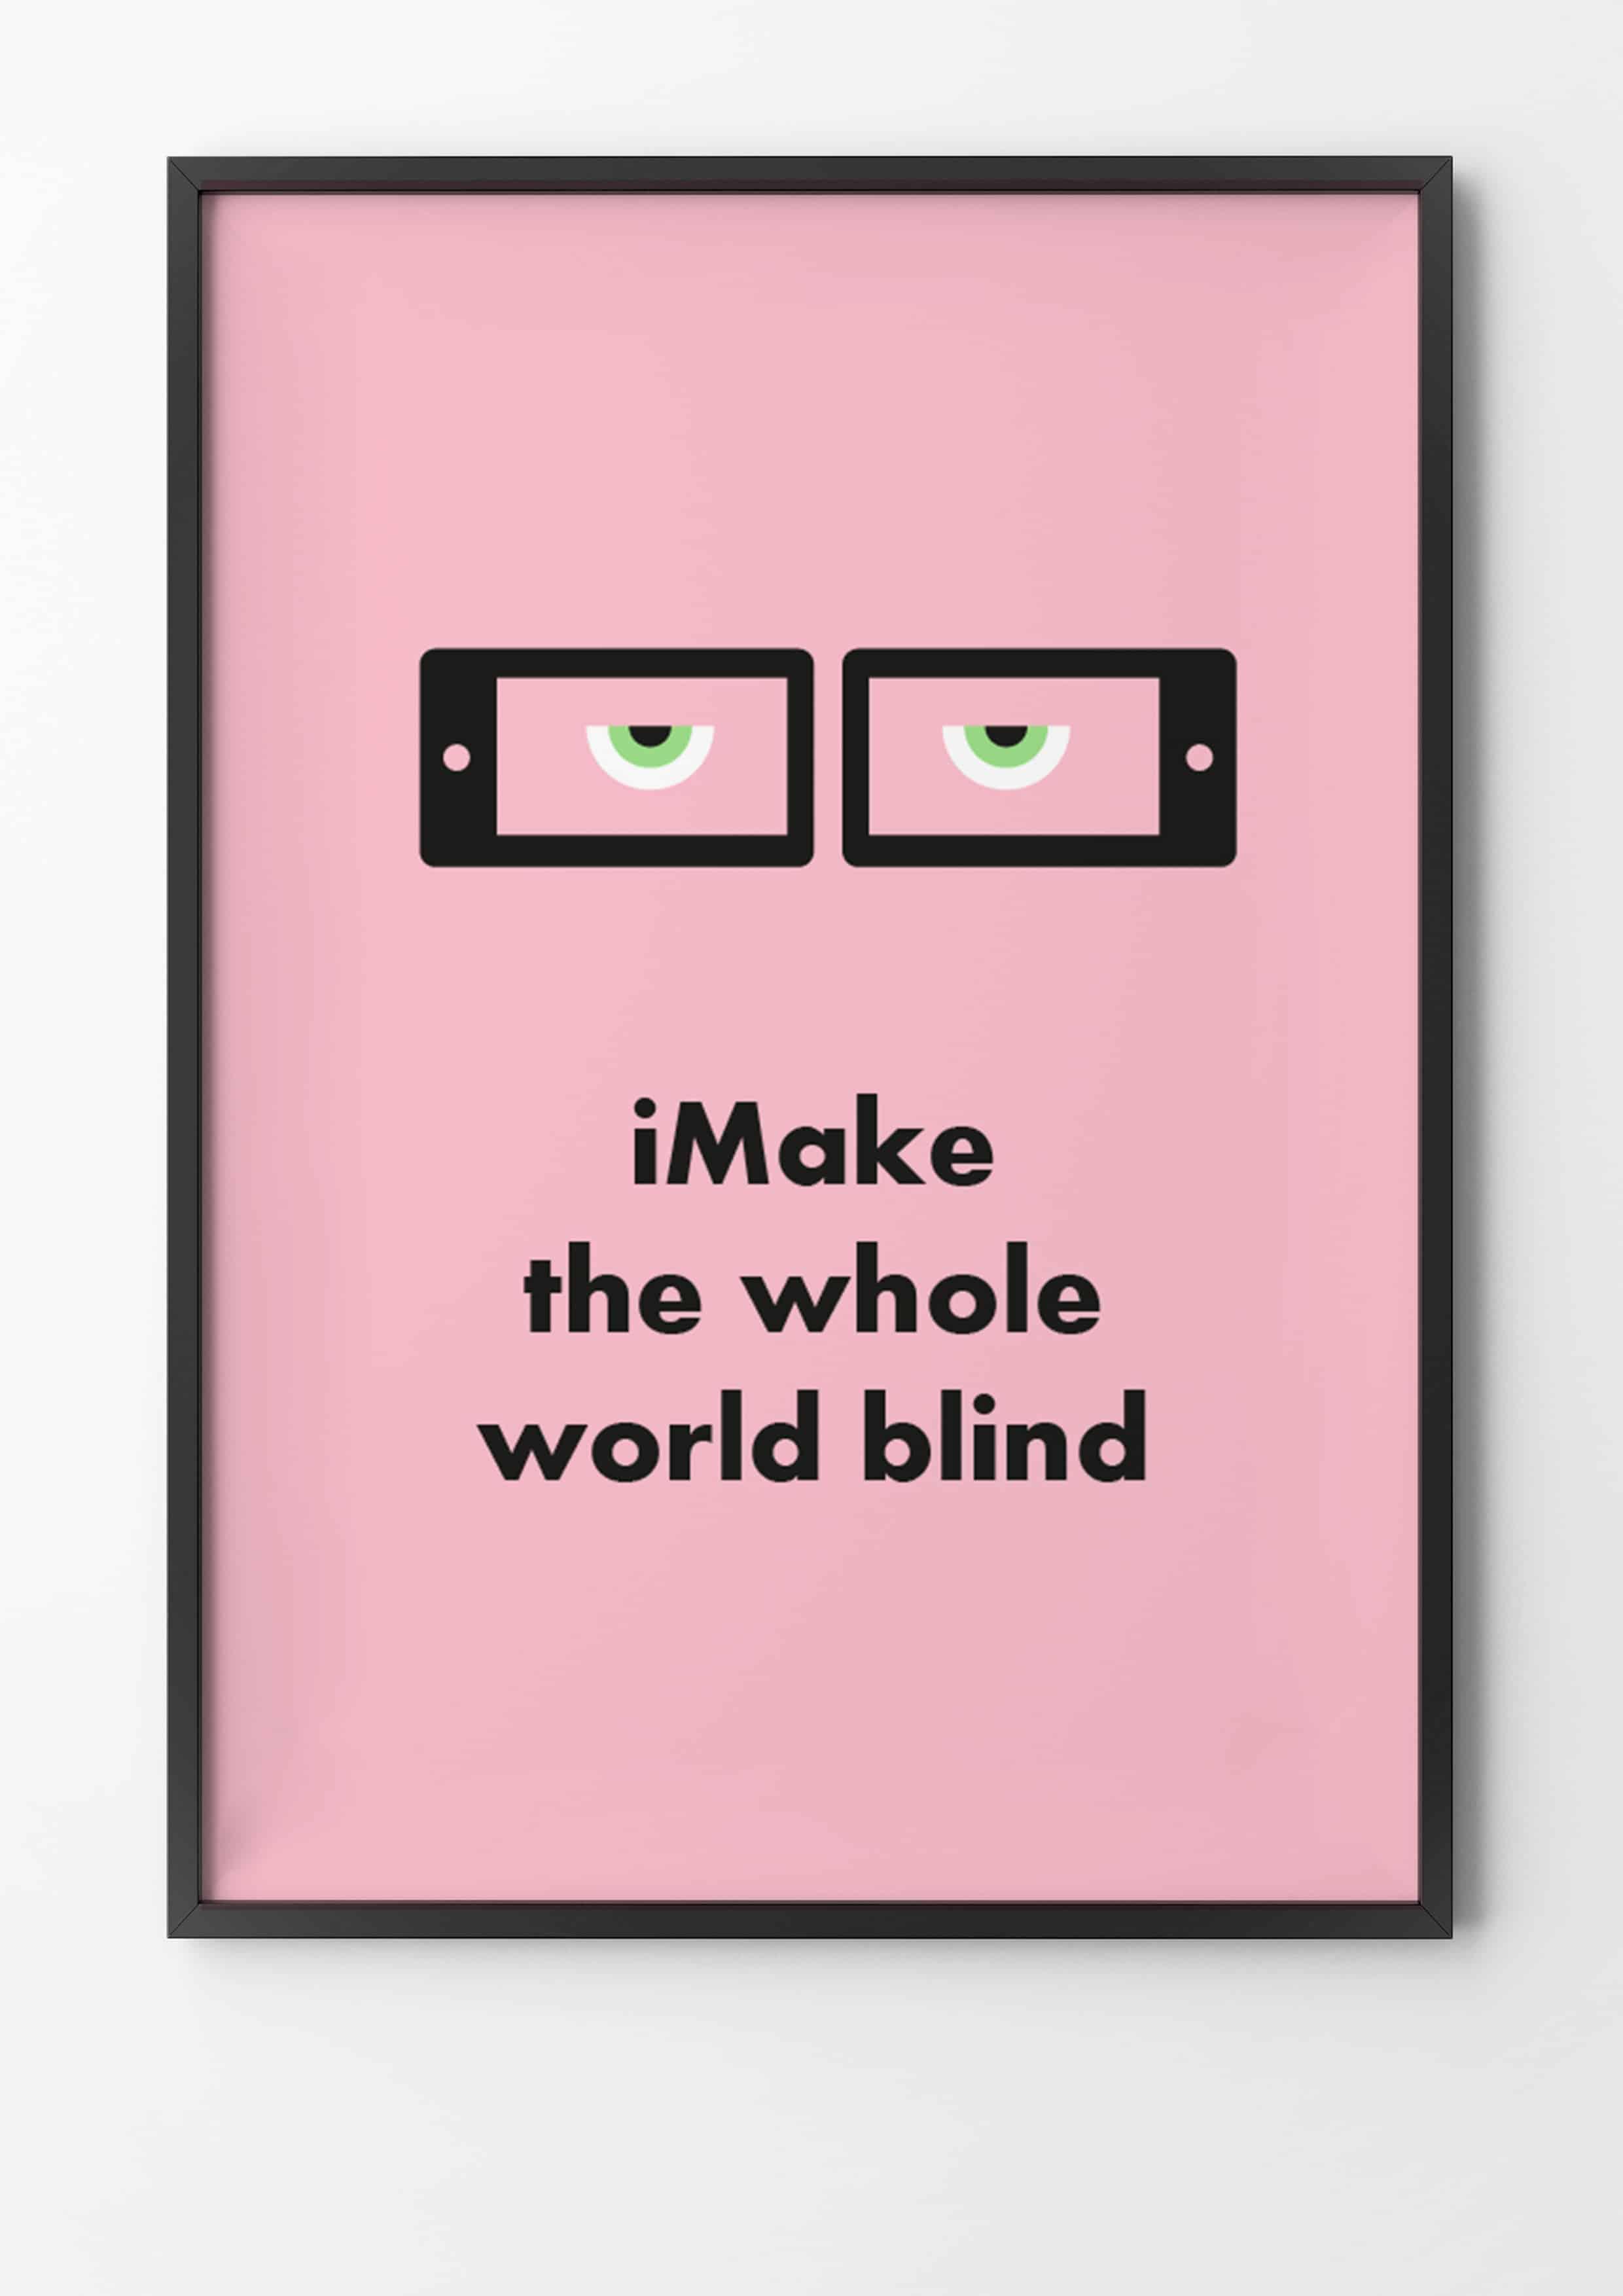 iPhone, make the whole world blind, Gandhi